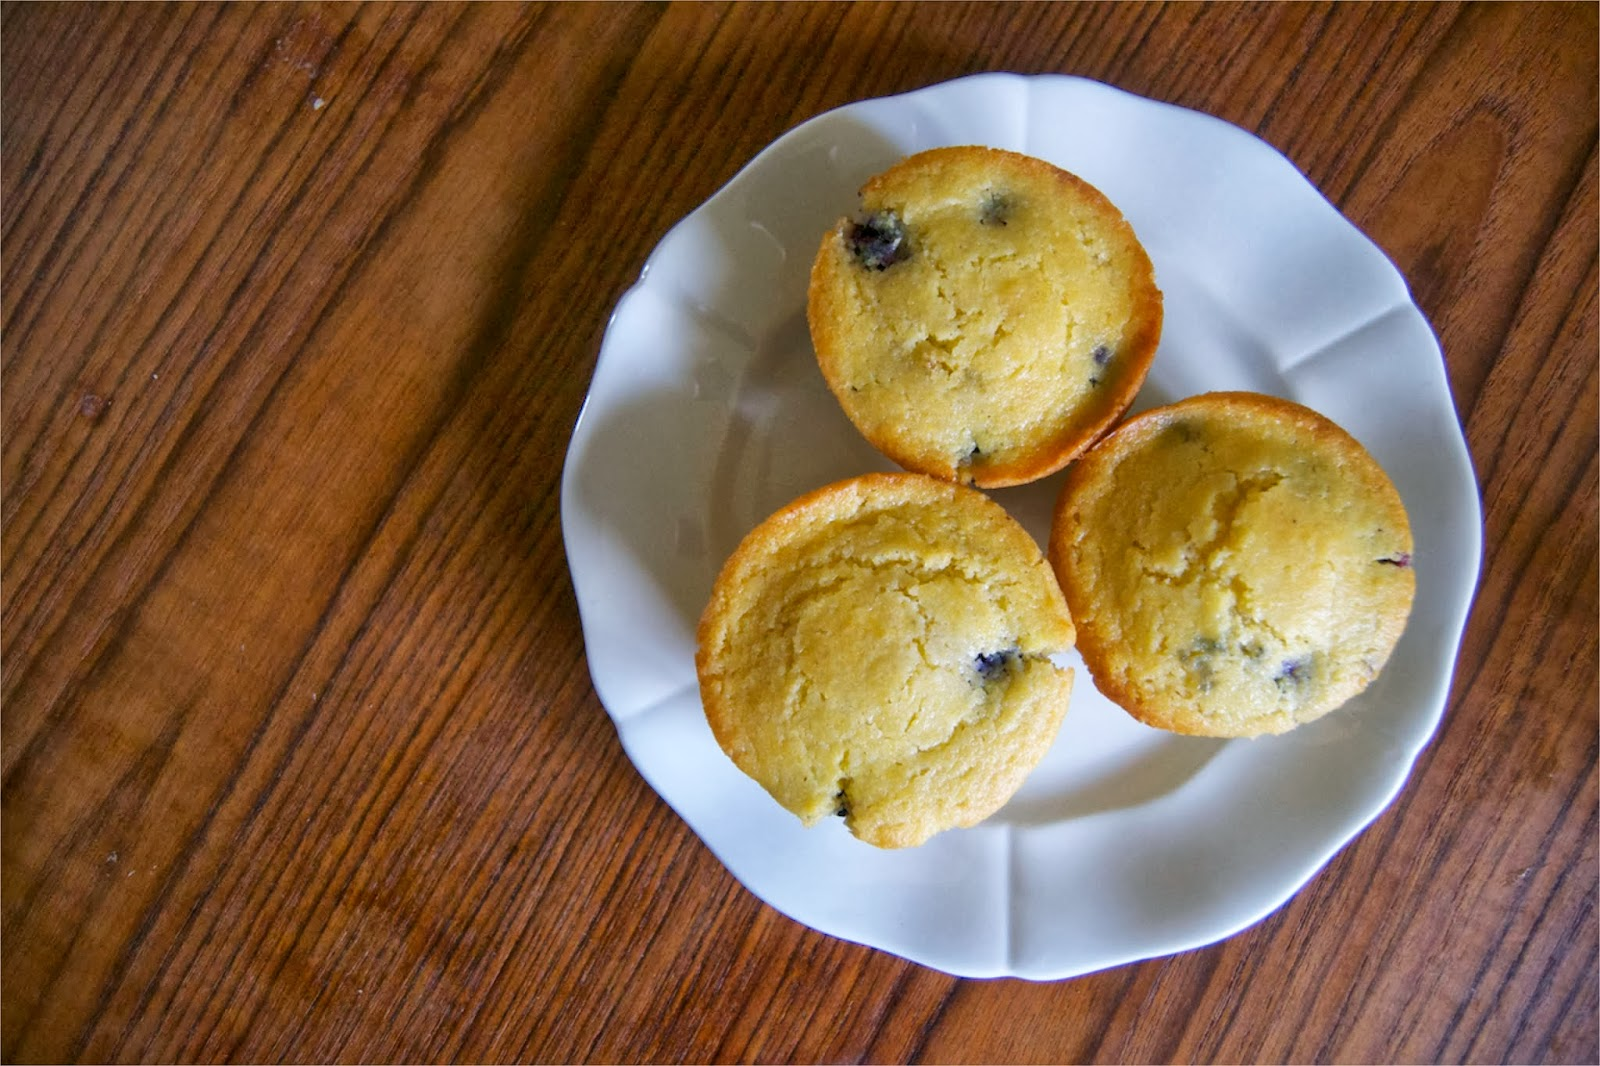 Blueberry Cornmeal Muffins – makes 12 muffins